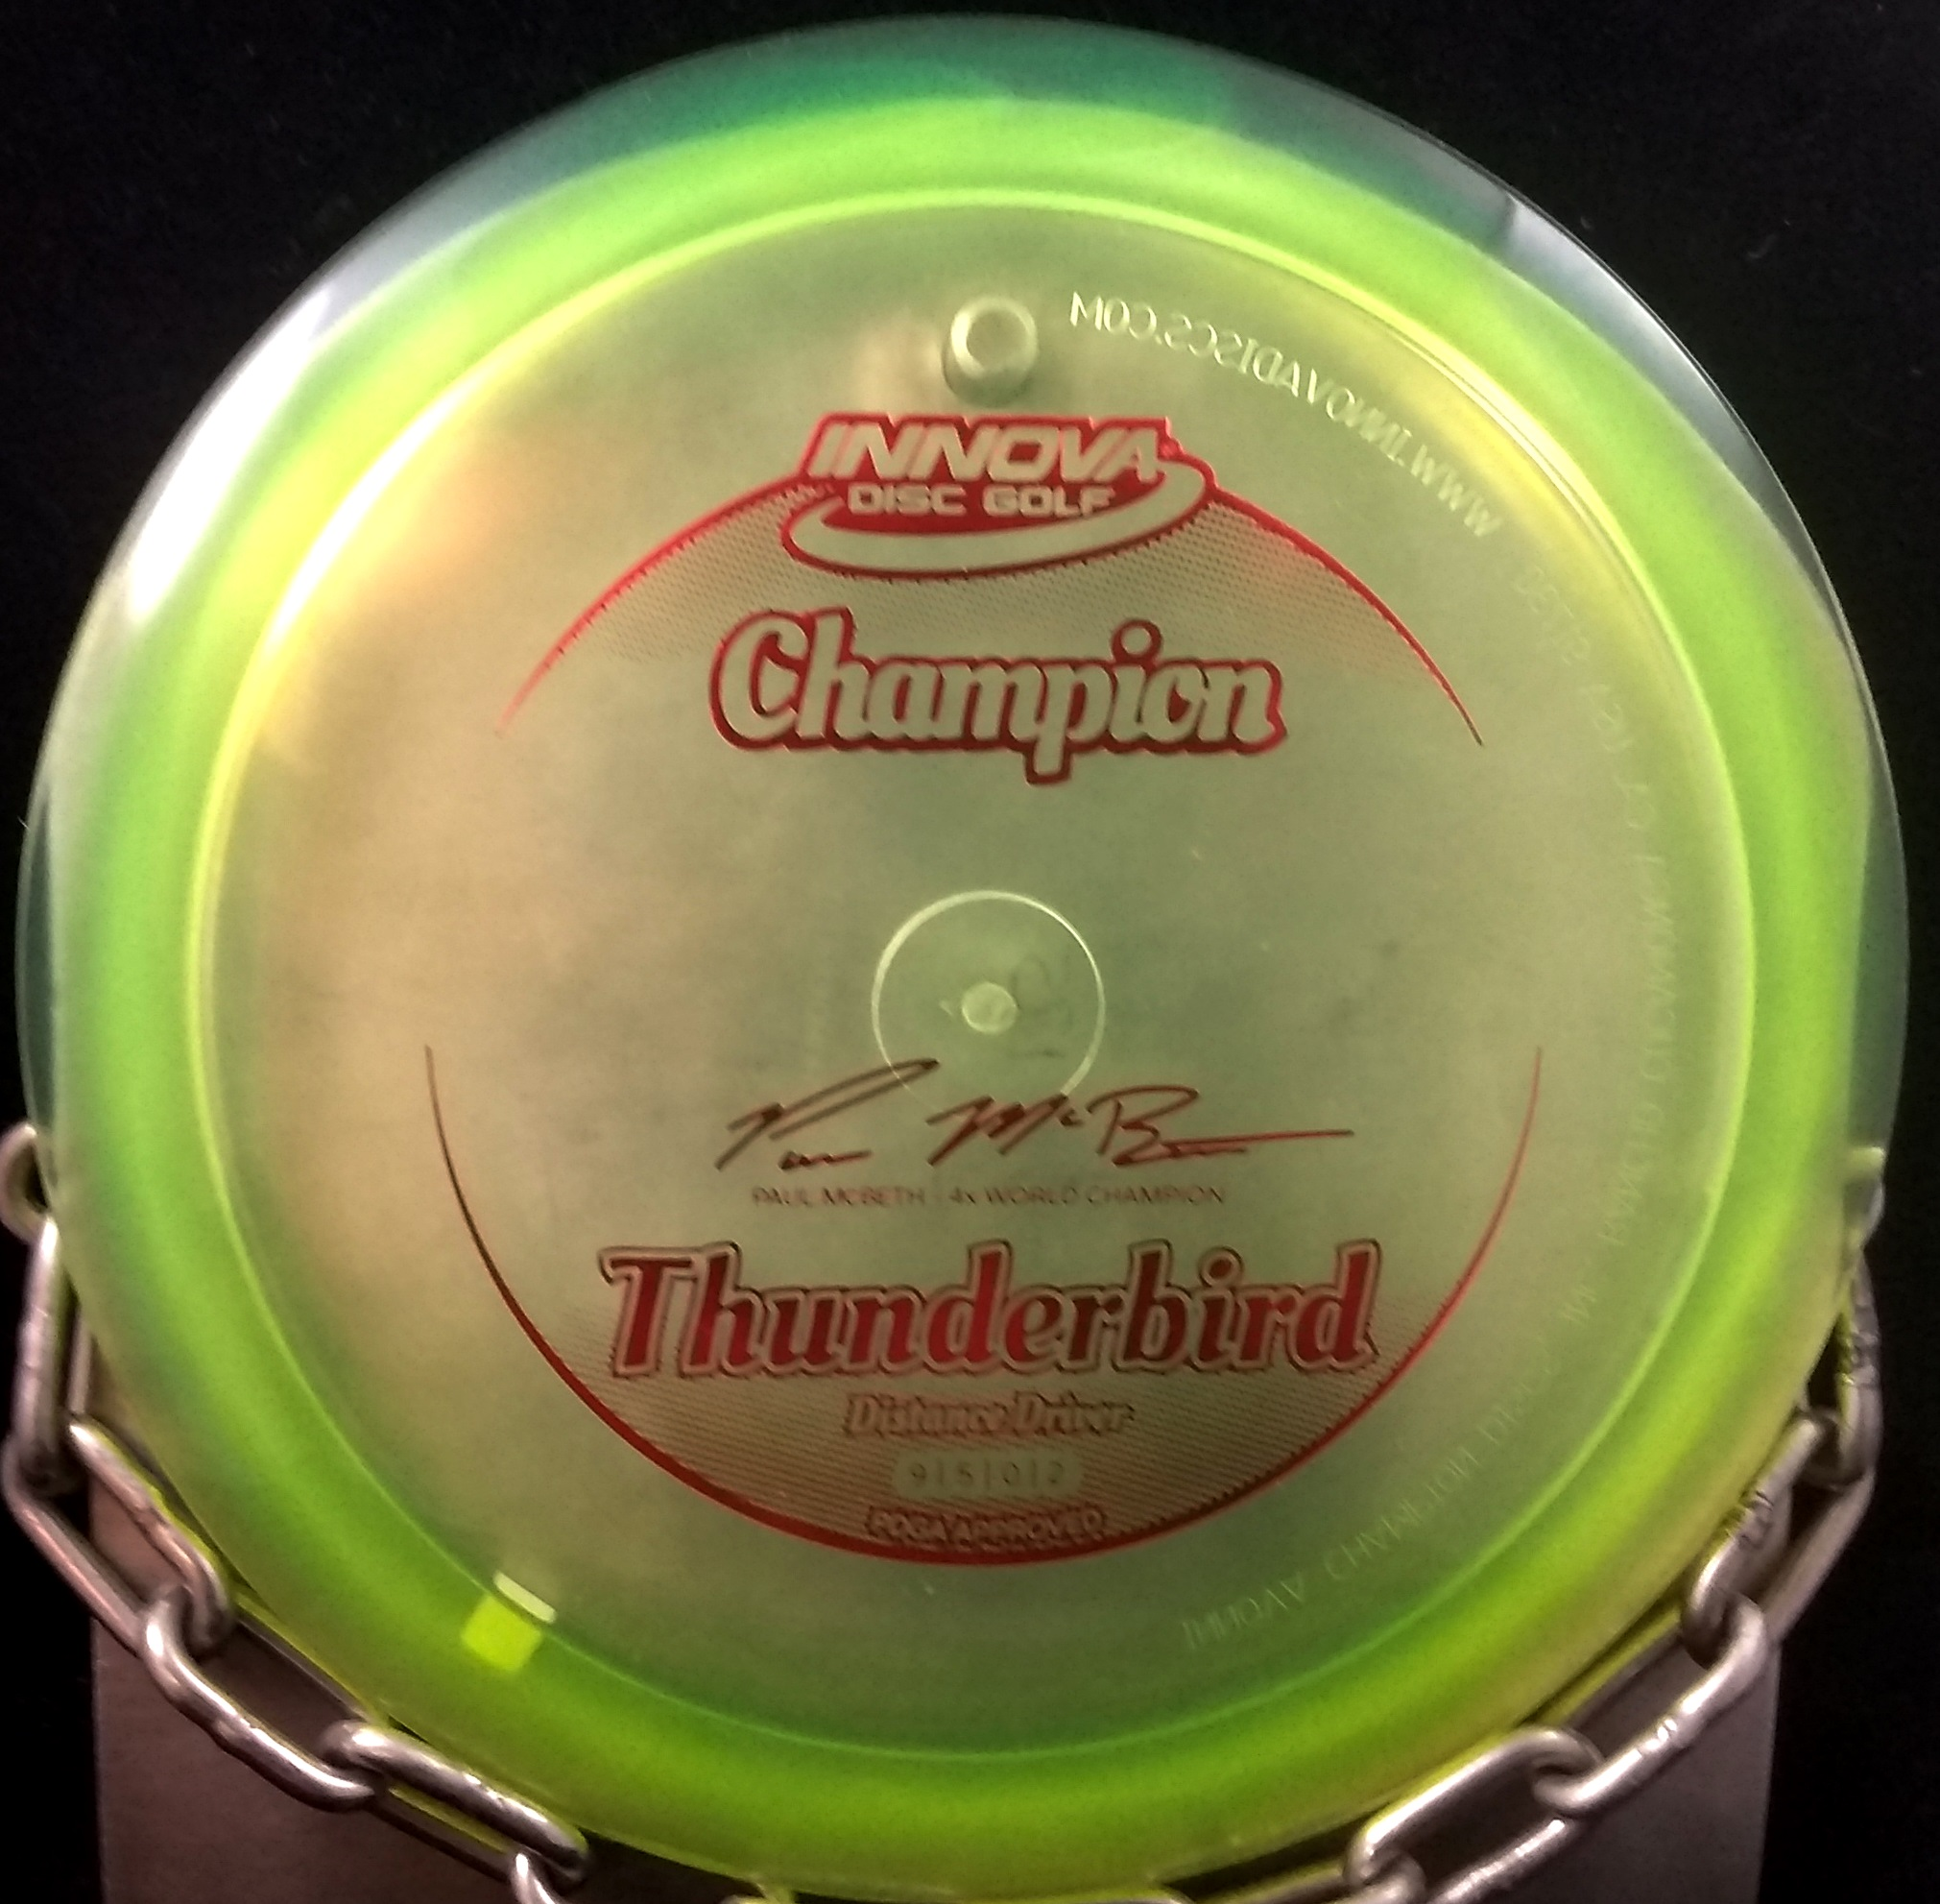 Paul McBeth 4 Time World Champion Innova Thunderbird Golf Disc